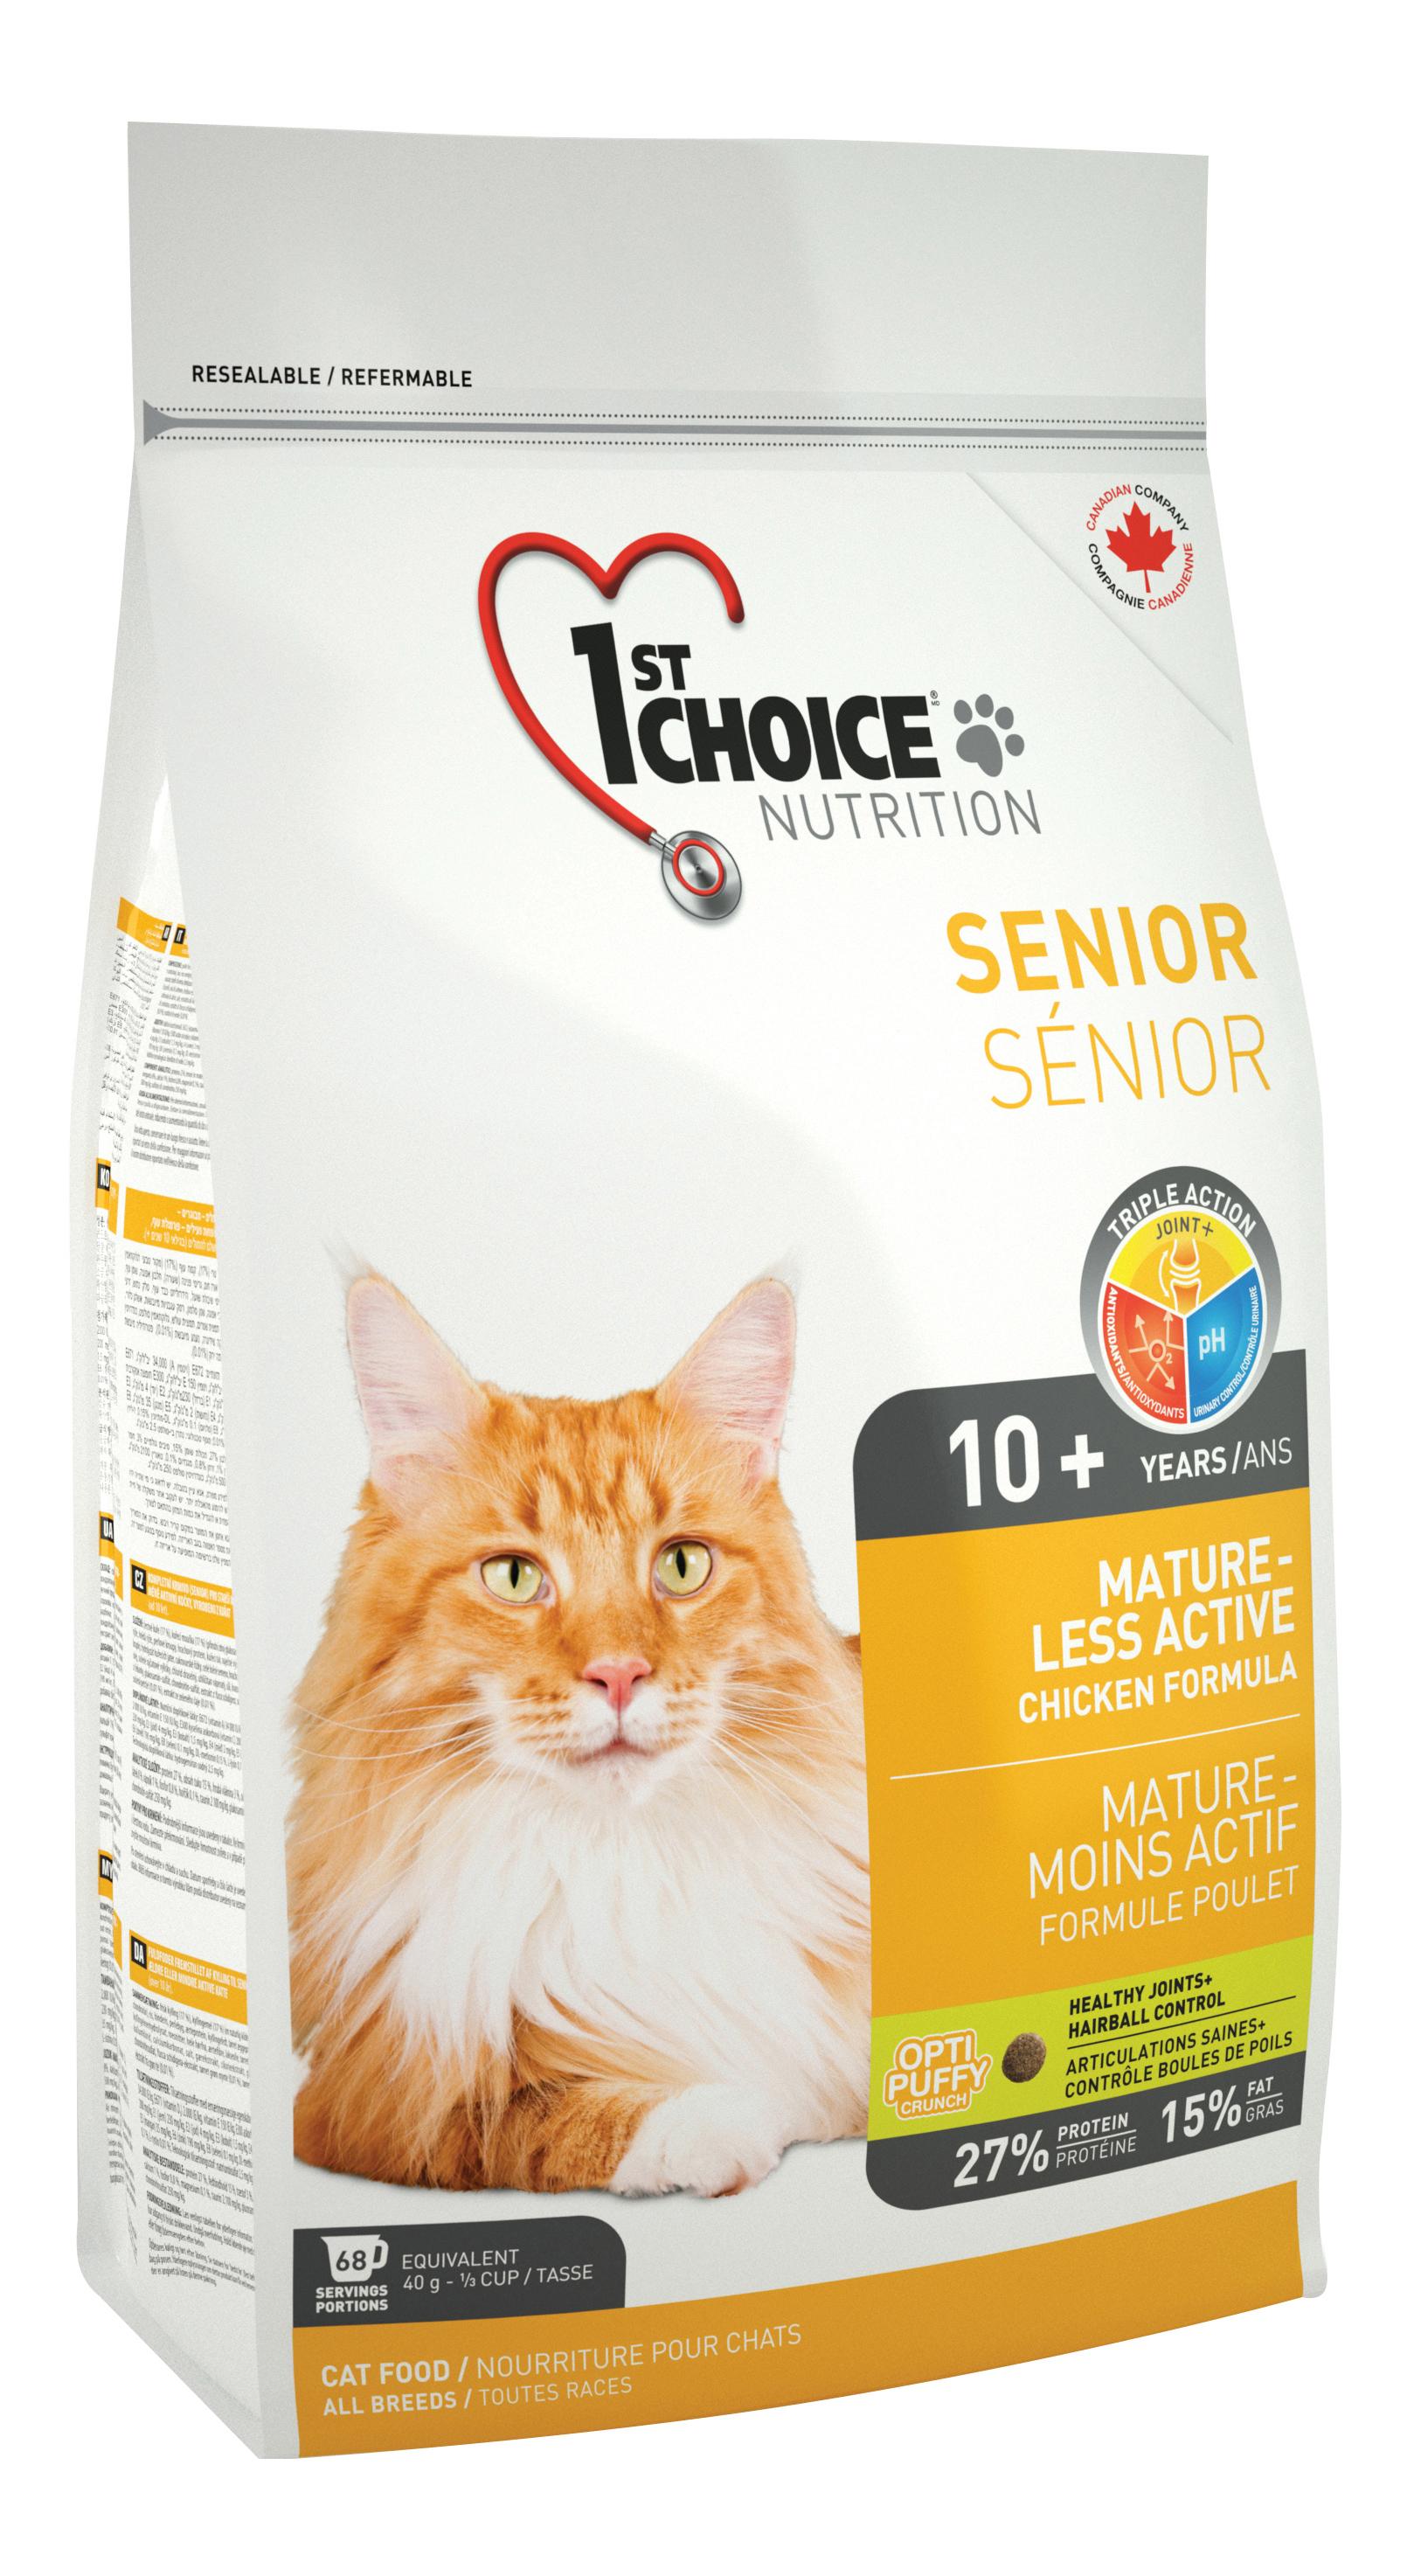 Сухой корм для кошек 1st choice Senior Mature or Less Active, цыпленок, 5,44кг фото